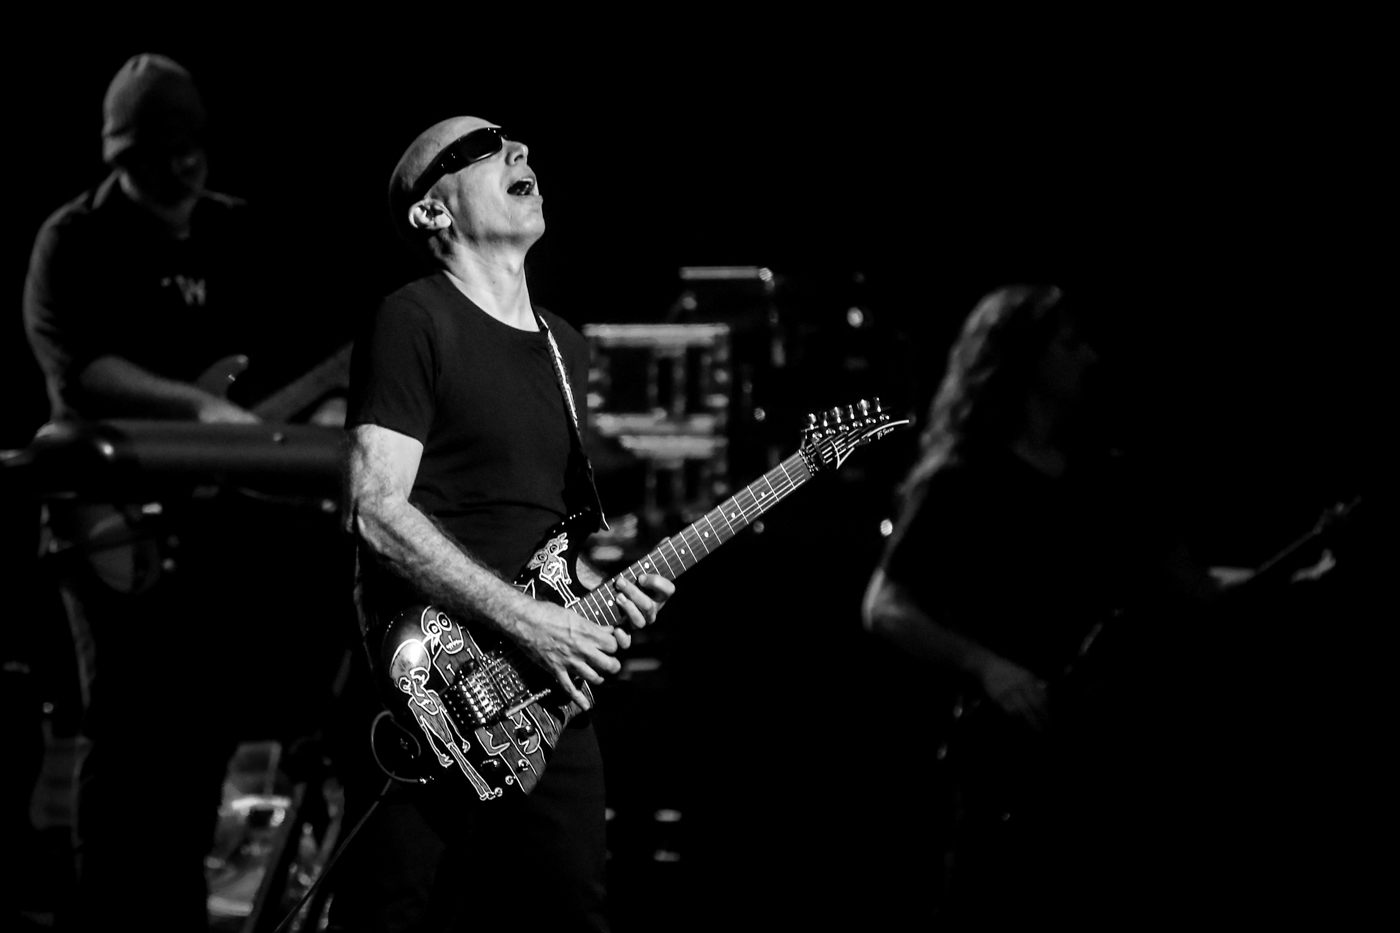 Joe Satriani - Music - Julián Rus - Music